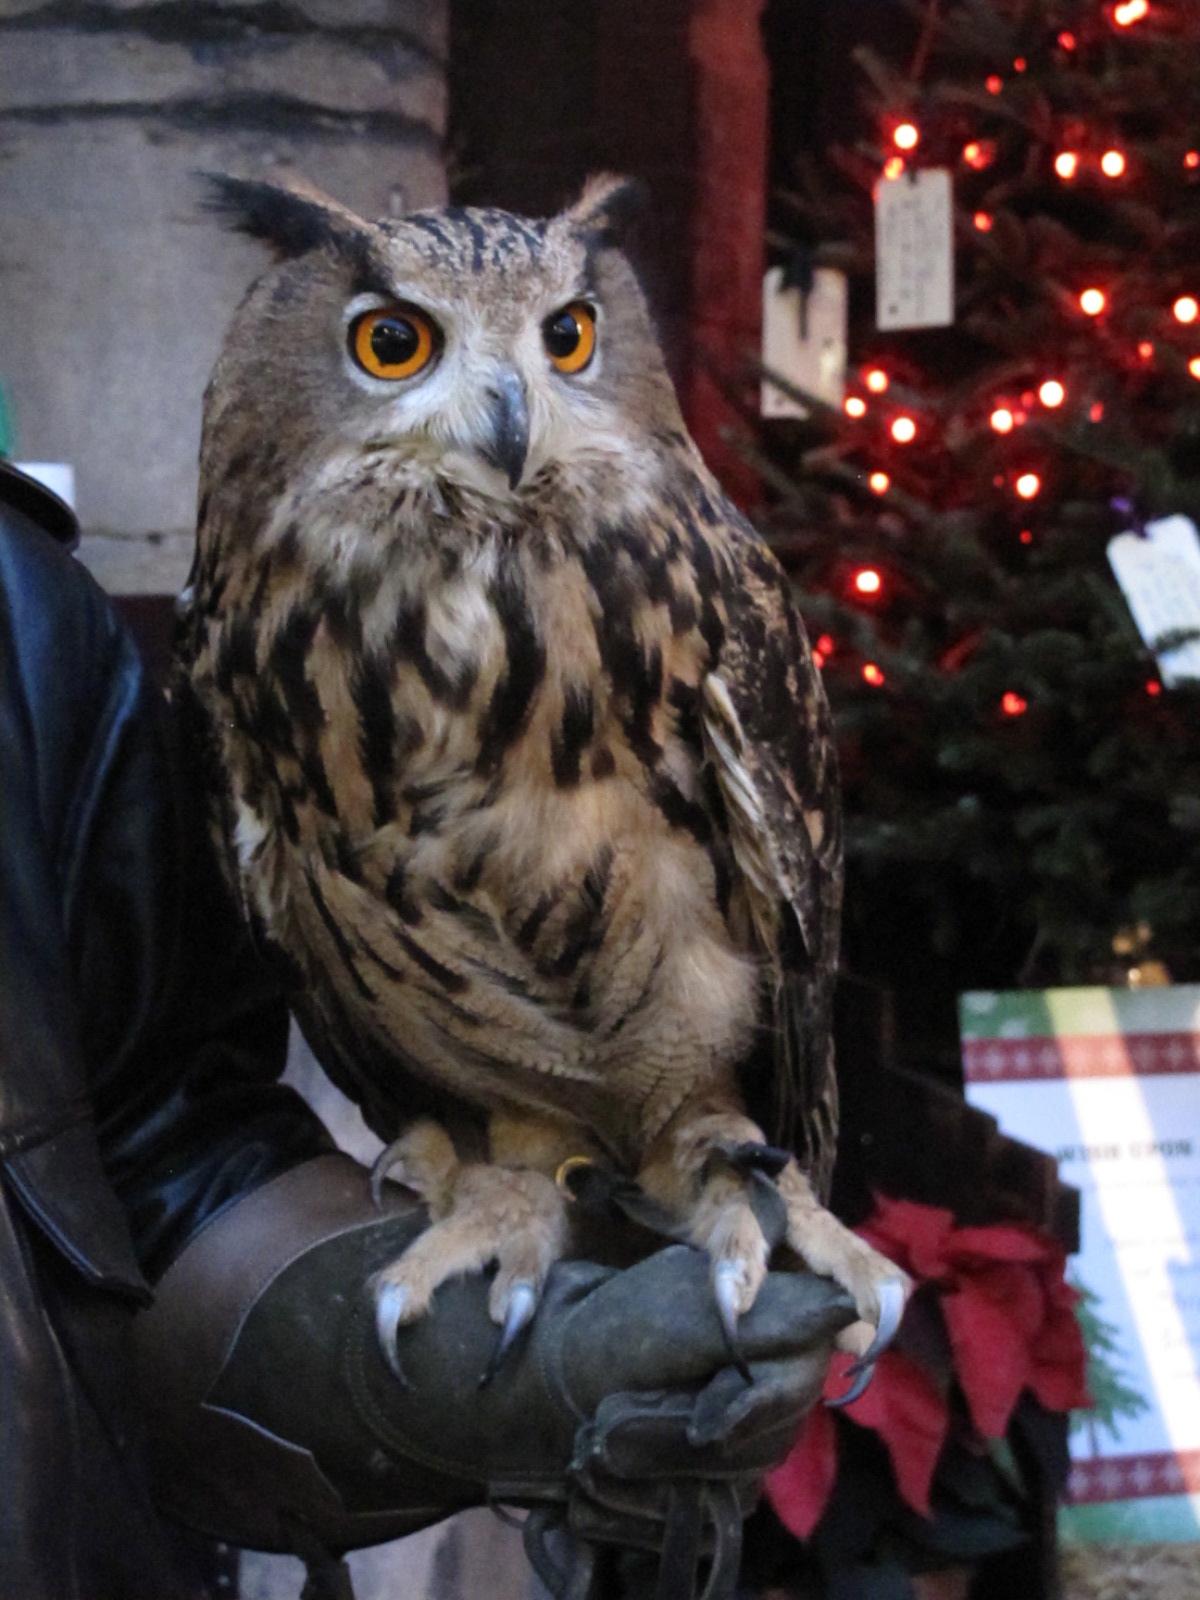 An owl with beautiful orange eyes.